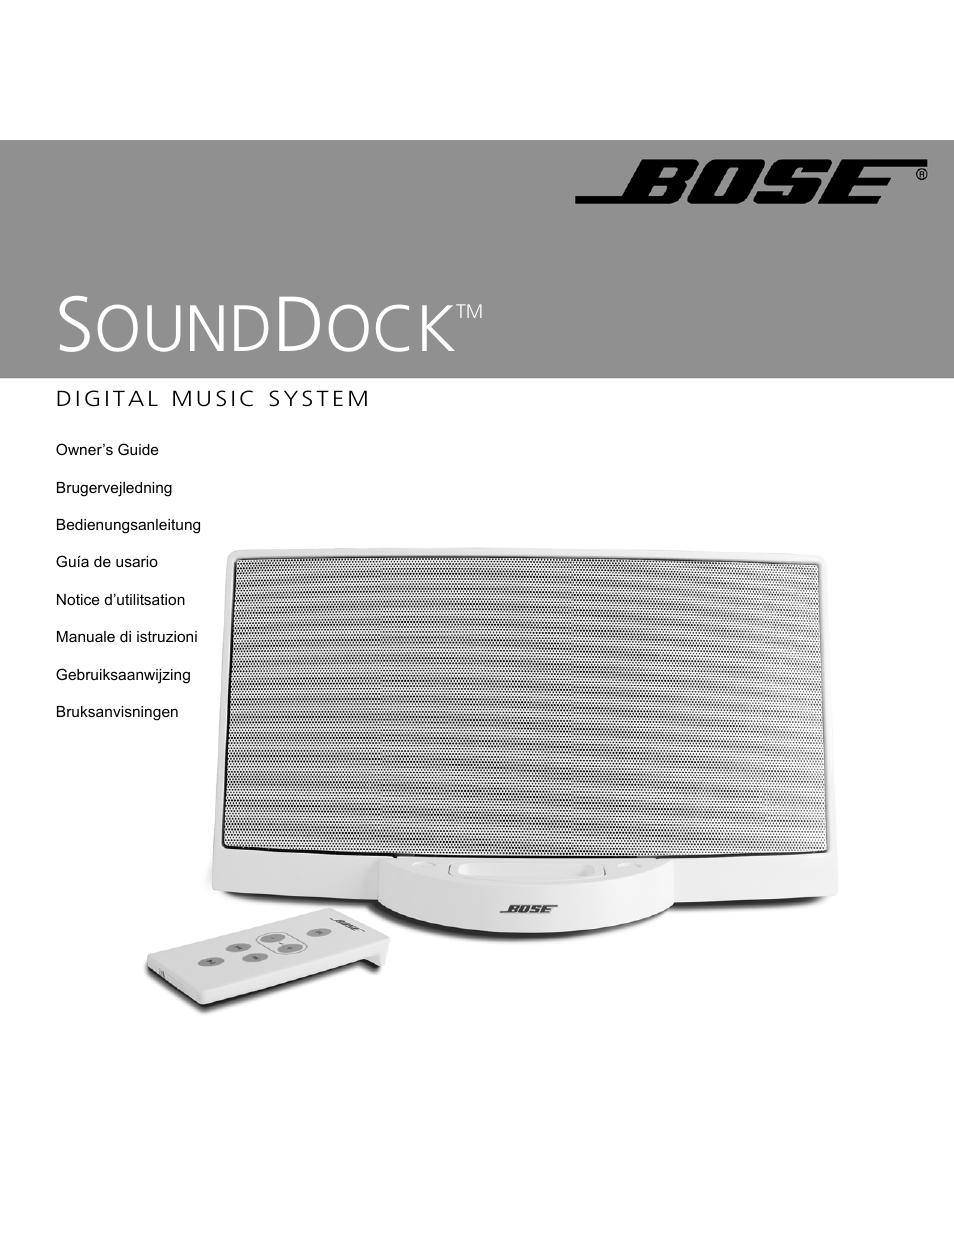 bose sounddock user manual 72 pages original mode rh manualsdir com bose sounddock 2 user manual bose sounddock iii user manual